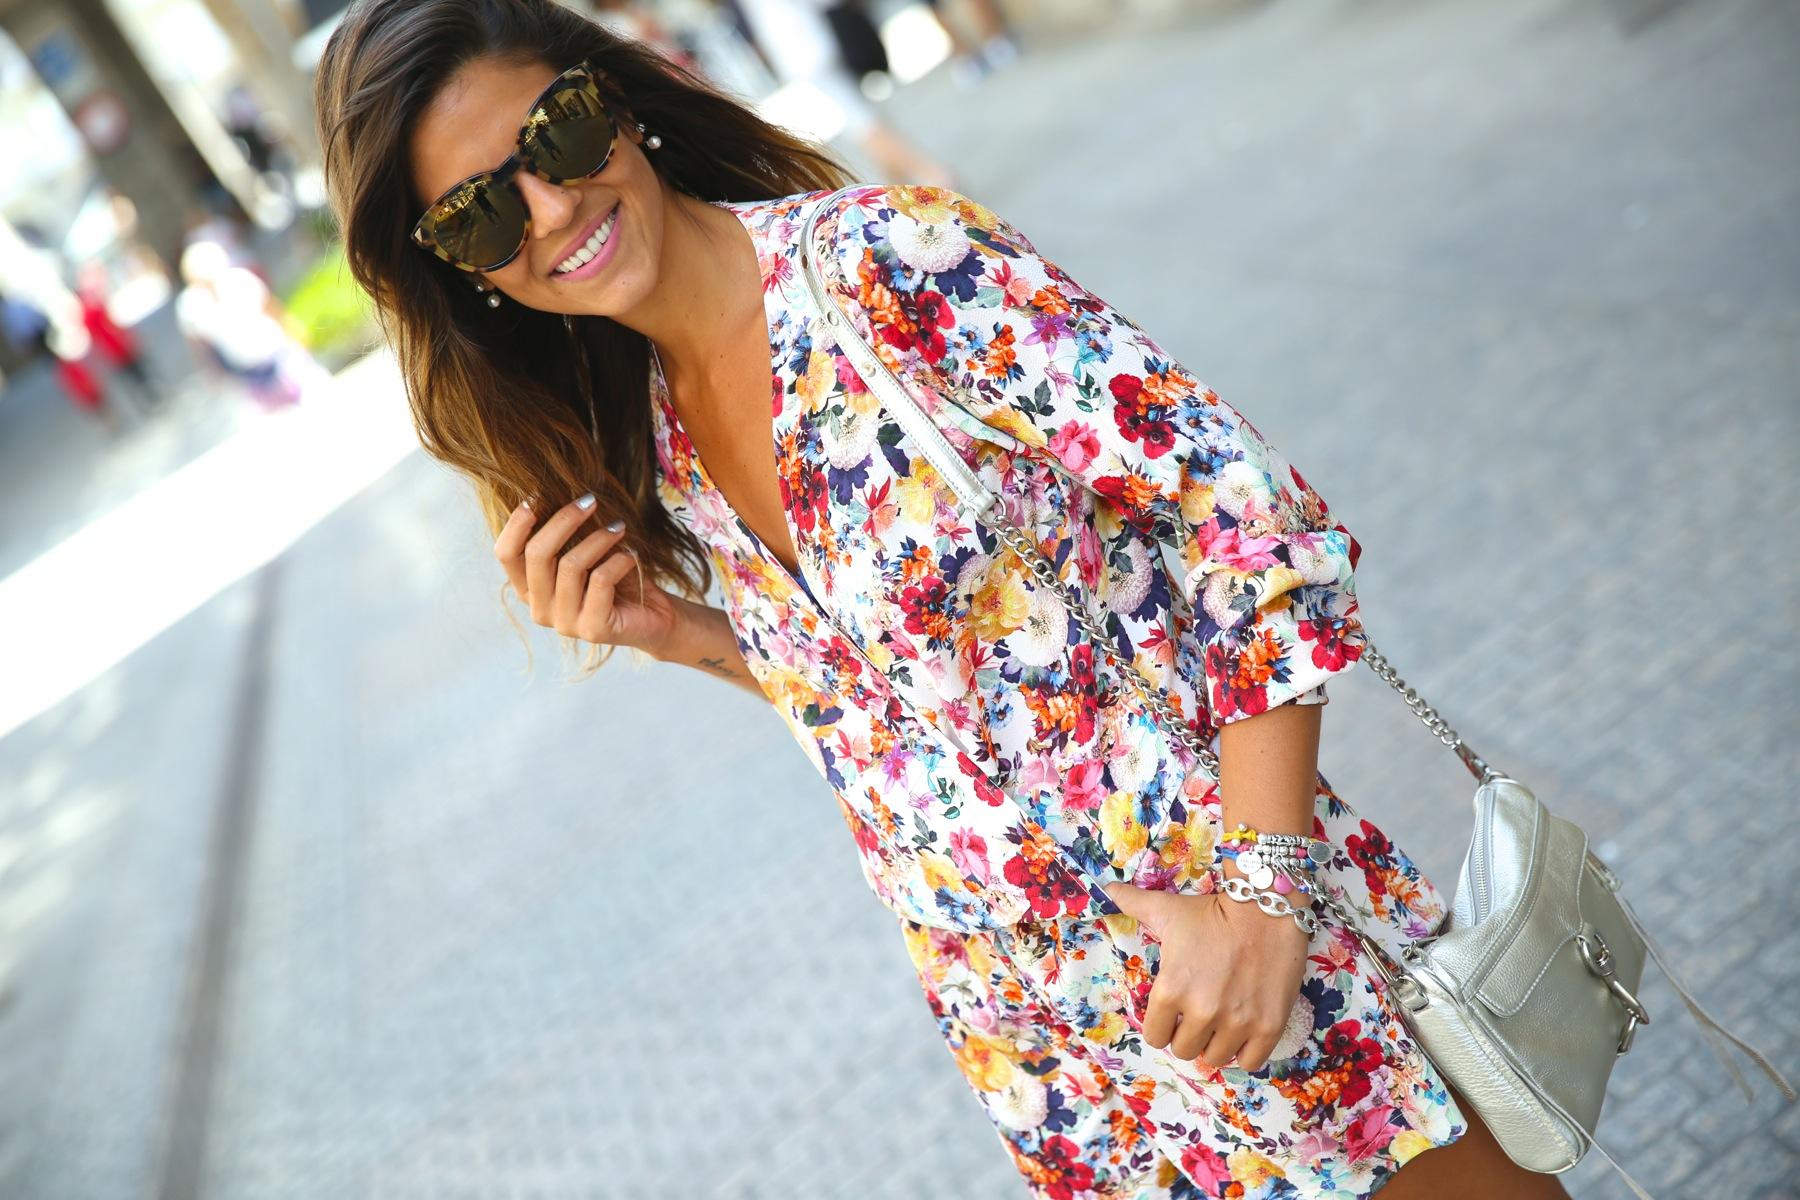 trendy_taste-look-outfit-street_style-ootd-blog-blogger-fashion_spain-moda_españa-mono-flores-flower_print-verano-summer-overall-la_coruña-4